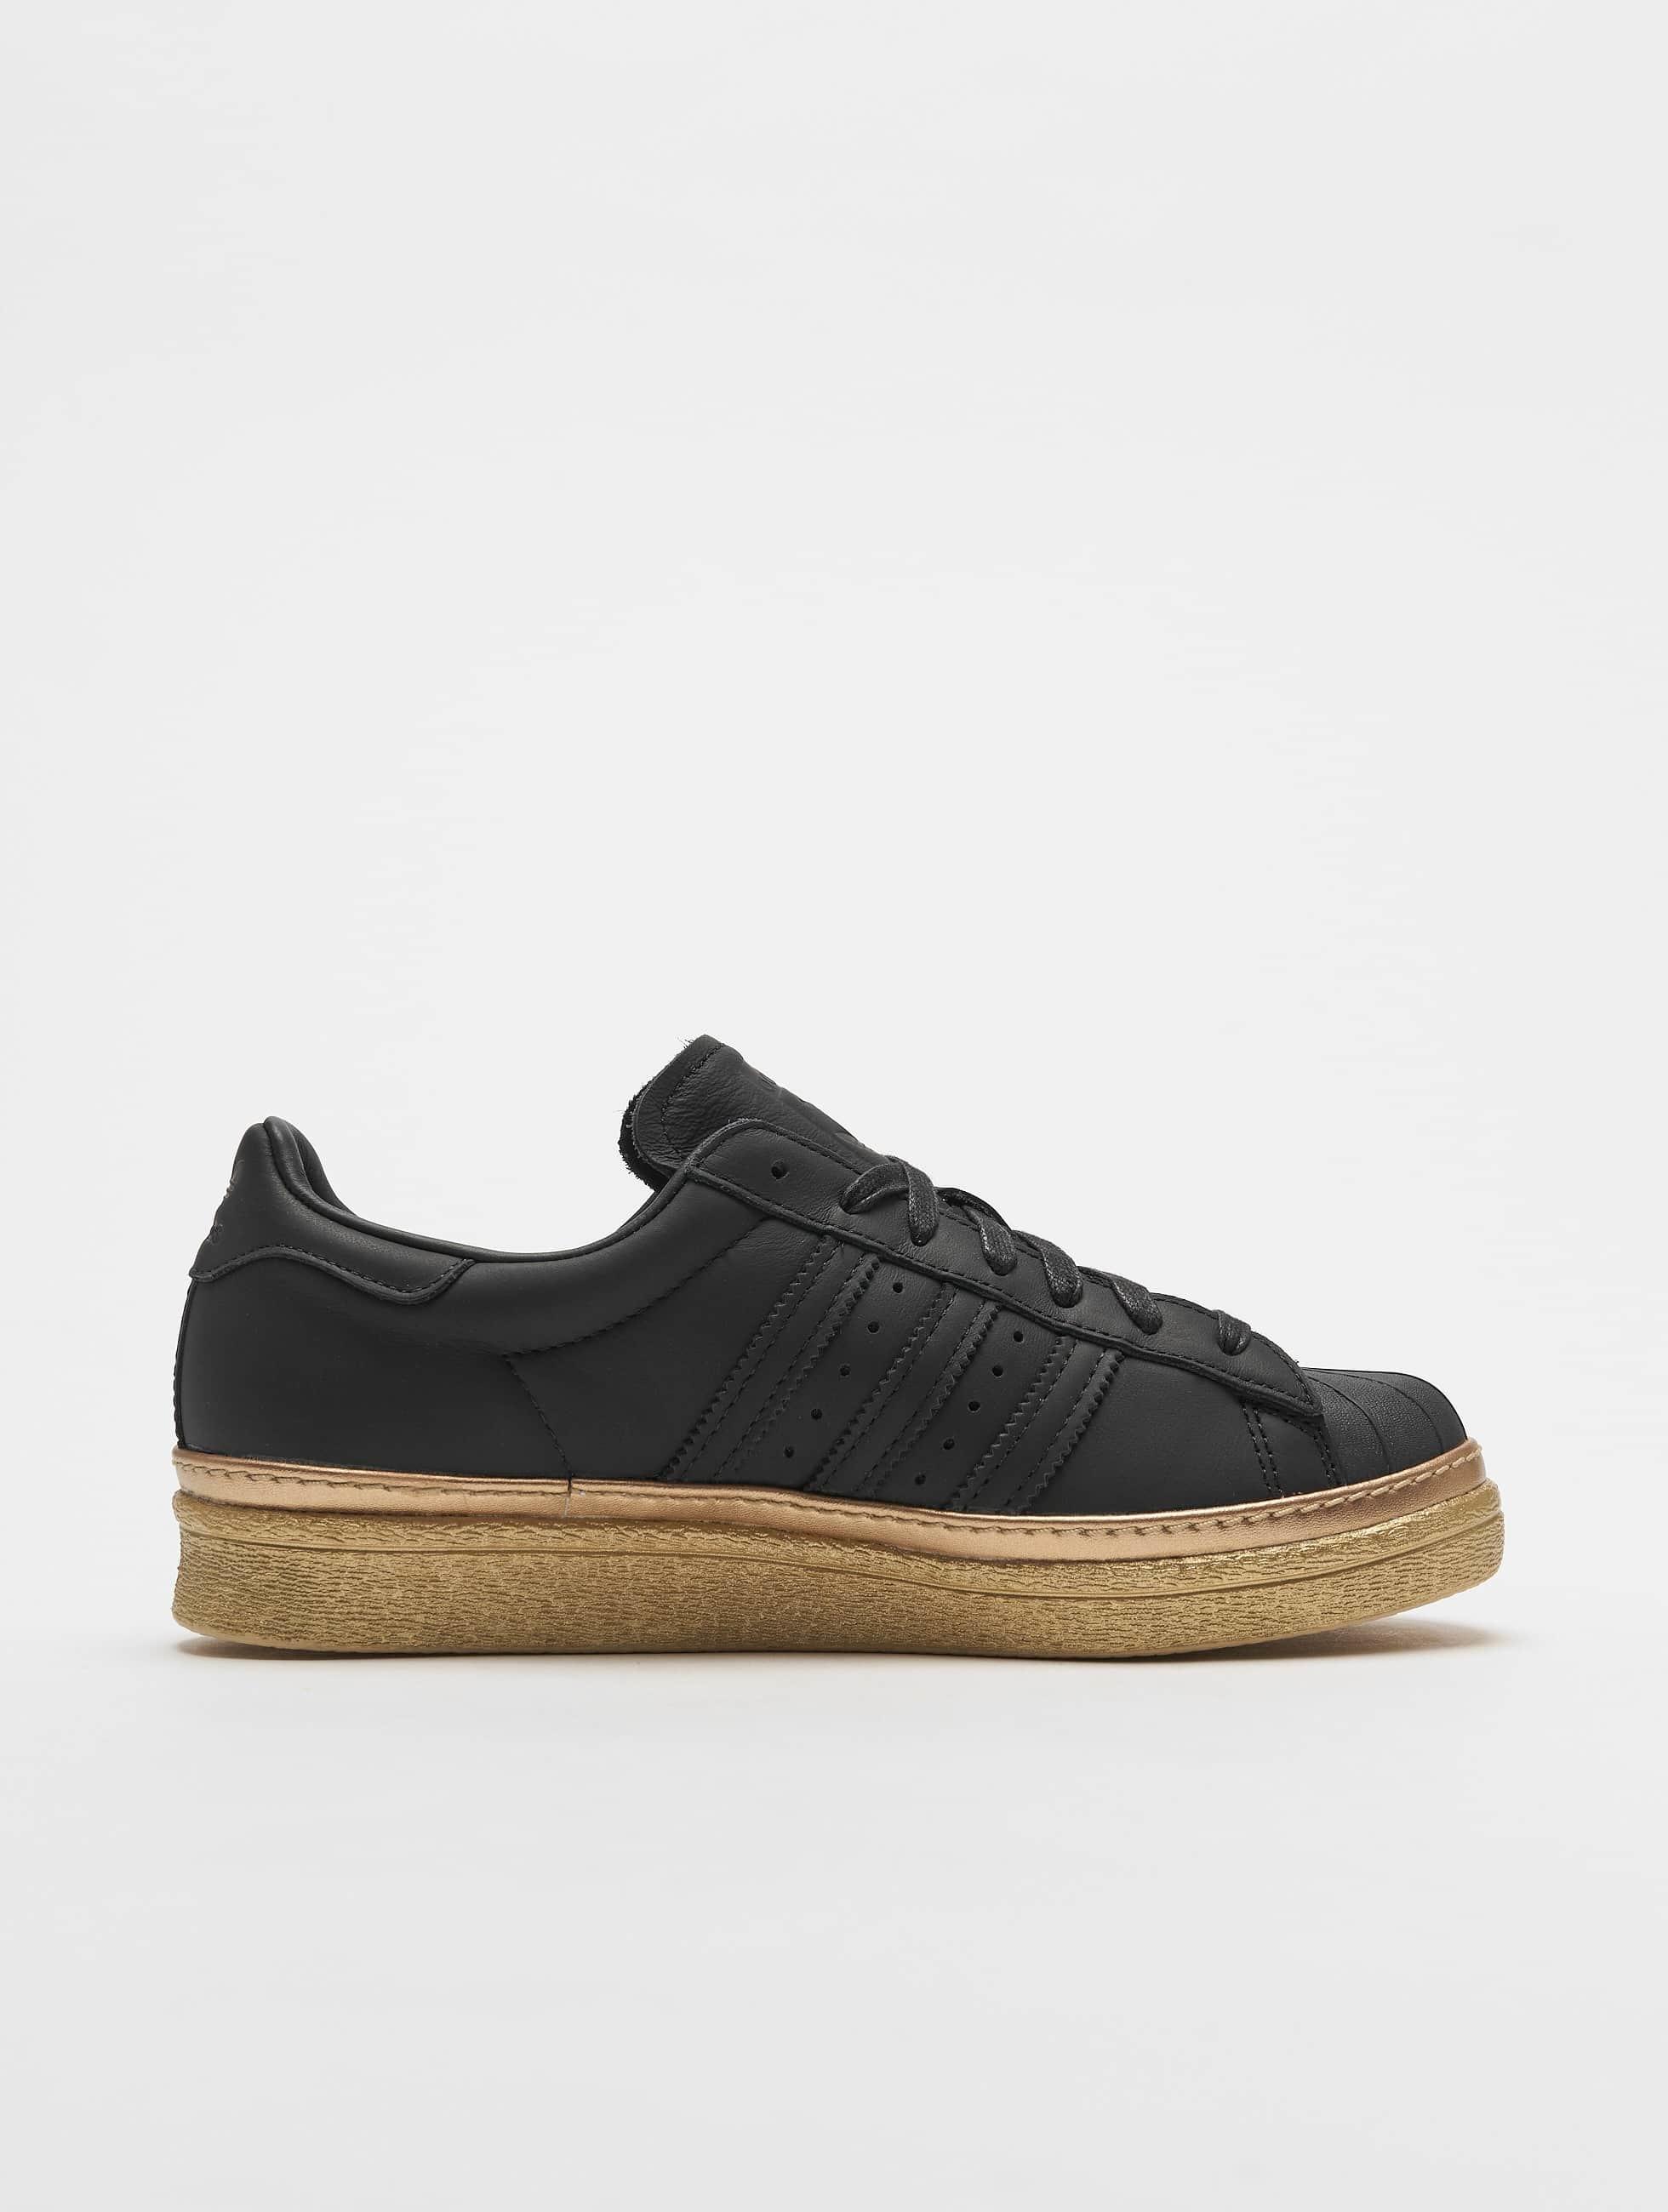 adidas originals Femme Chaussures / Baskets Superstar Superstar Superstar 80s New Bo 345e7a